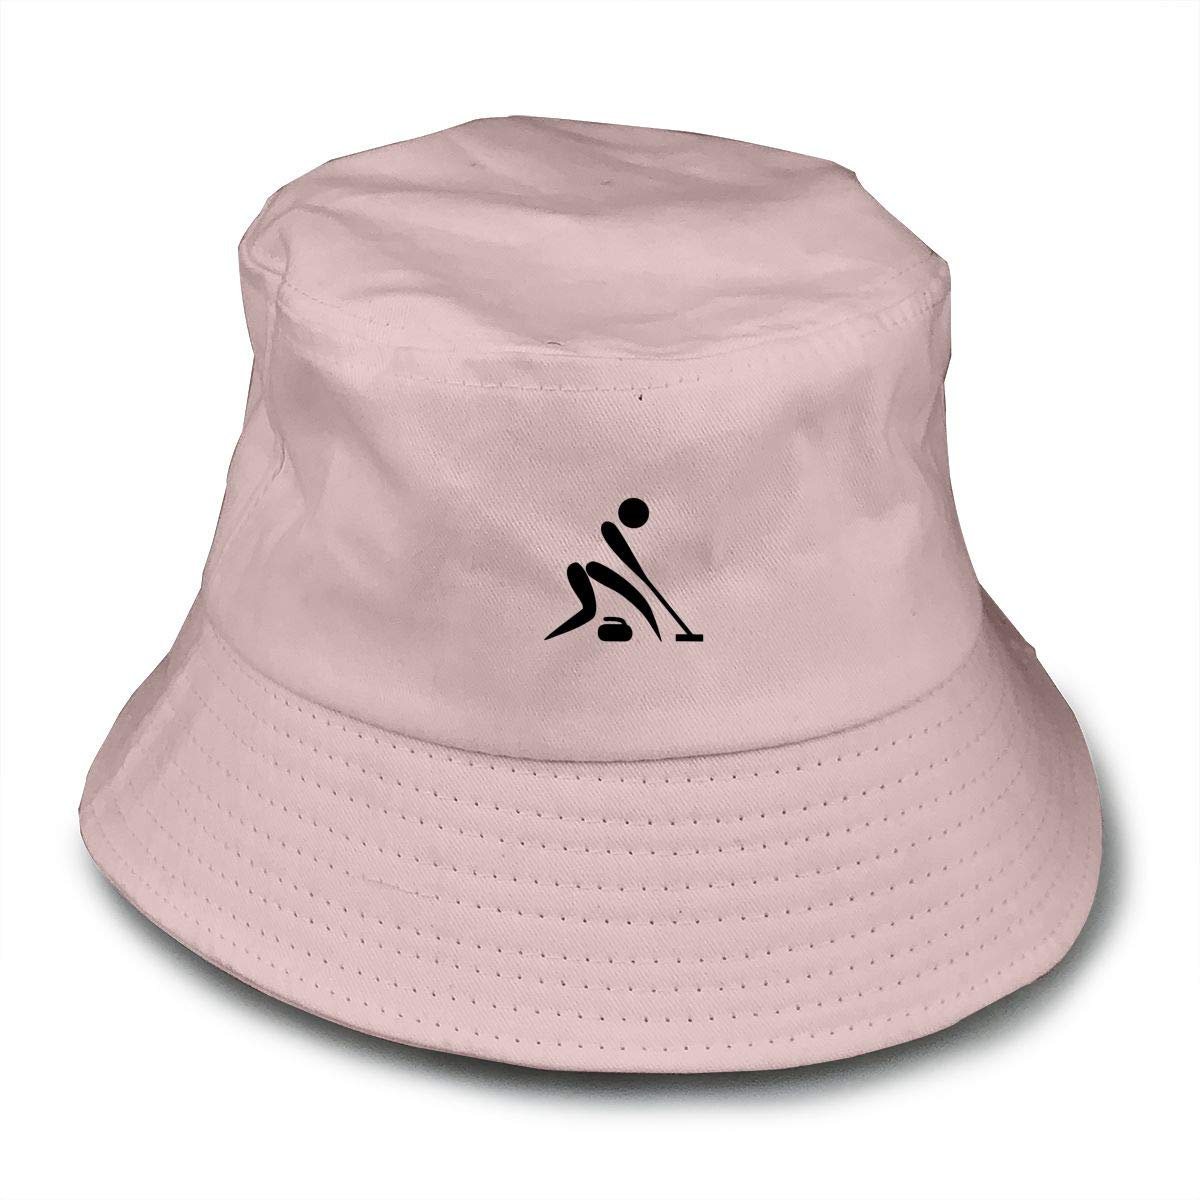 PPAN Curling Unisex Cotton Packable White Travel Bucket Hat Fishing Cap